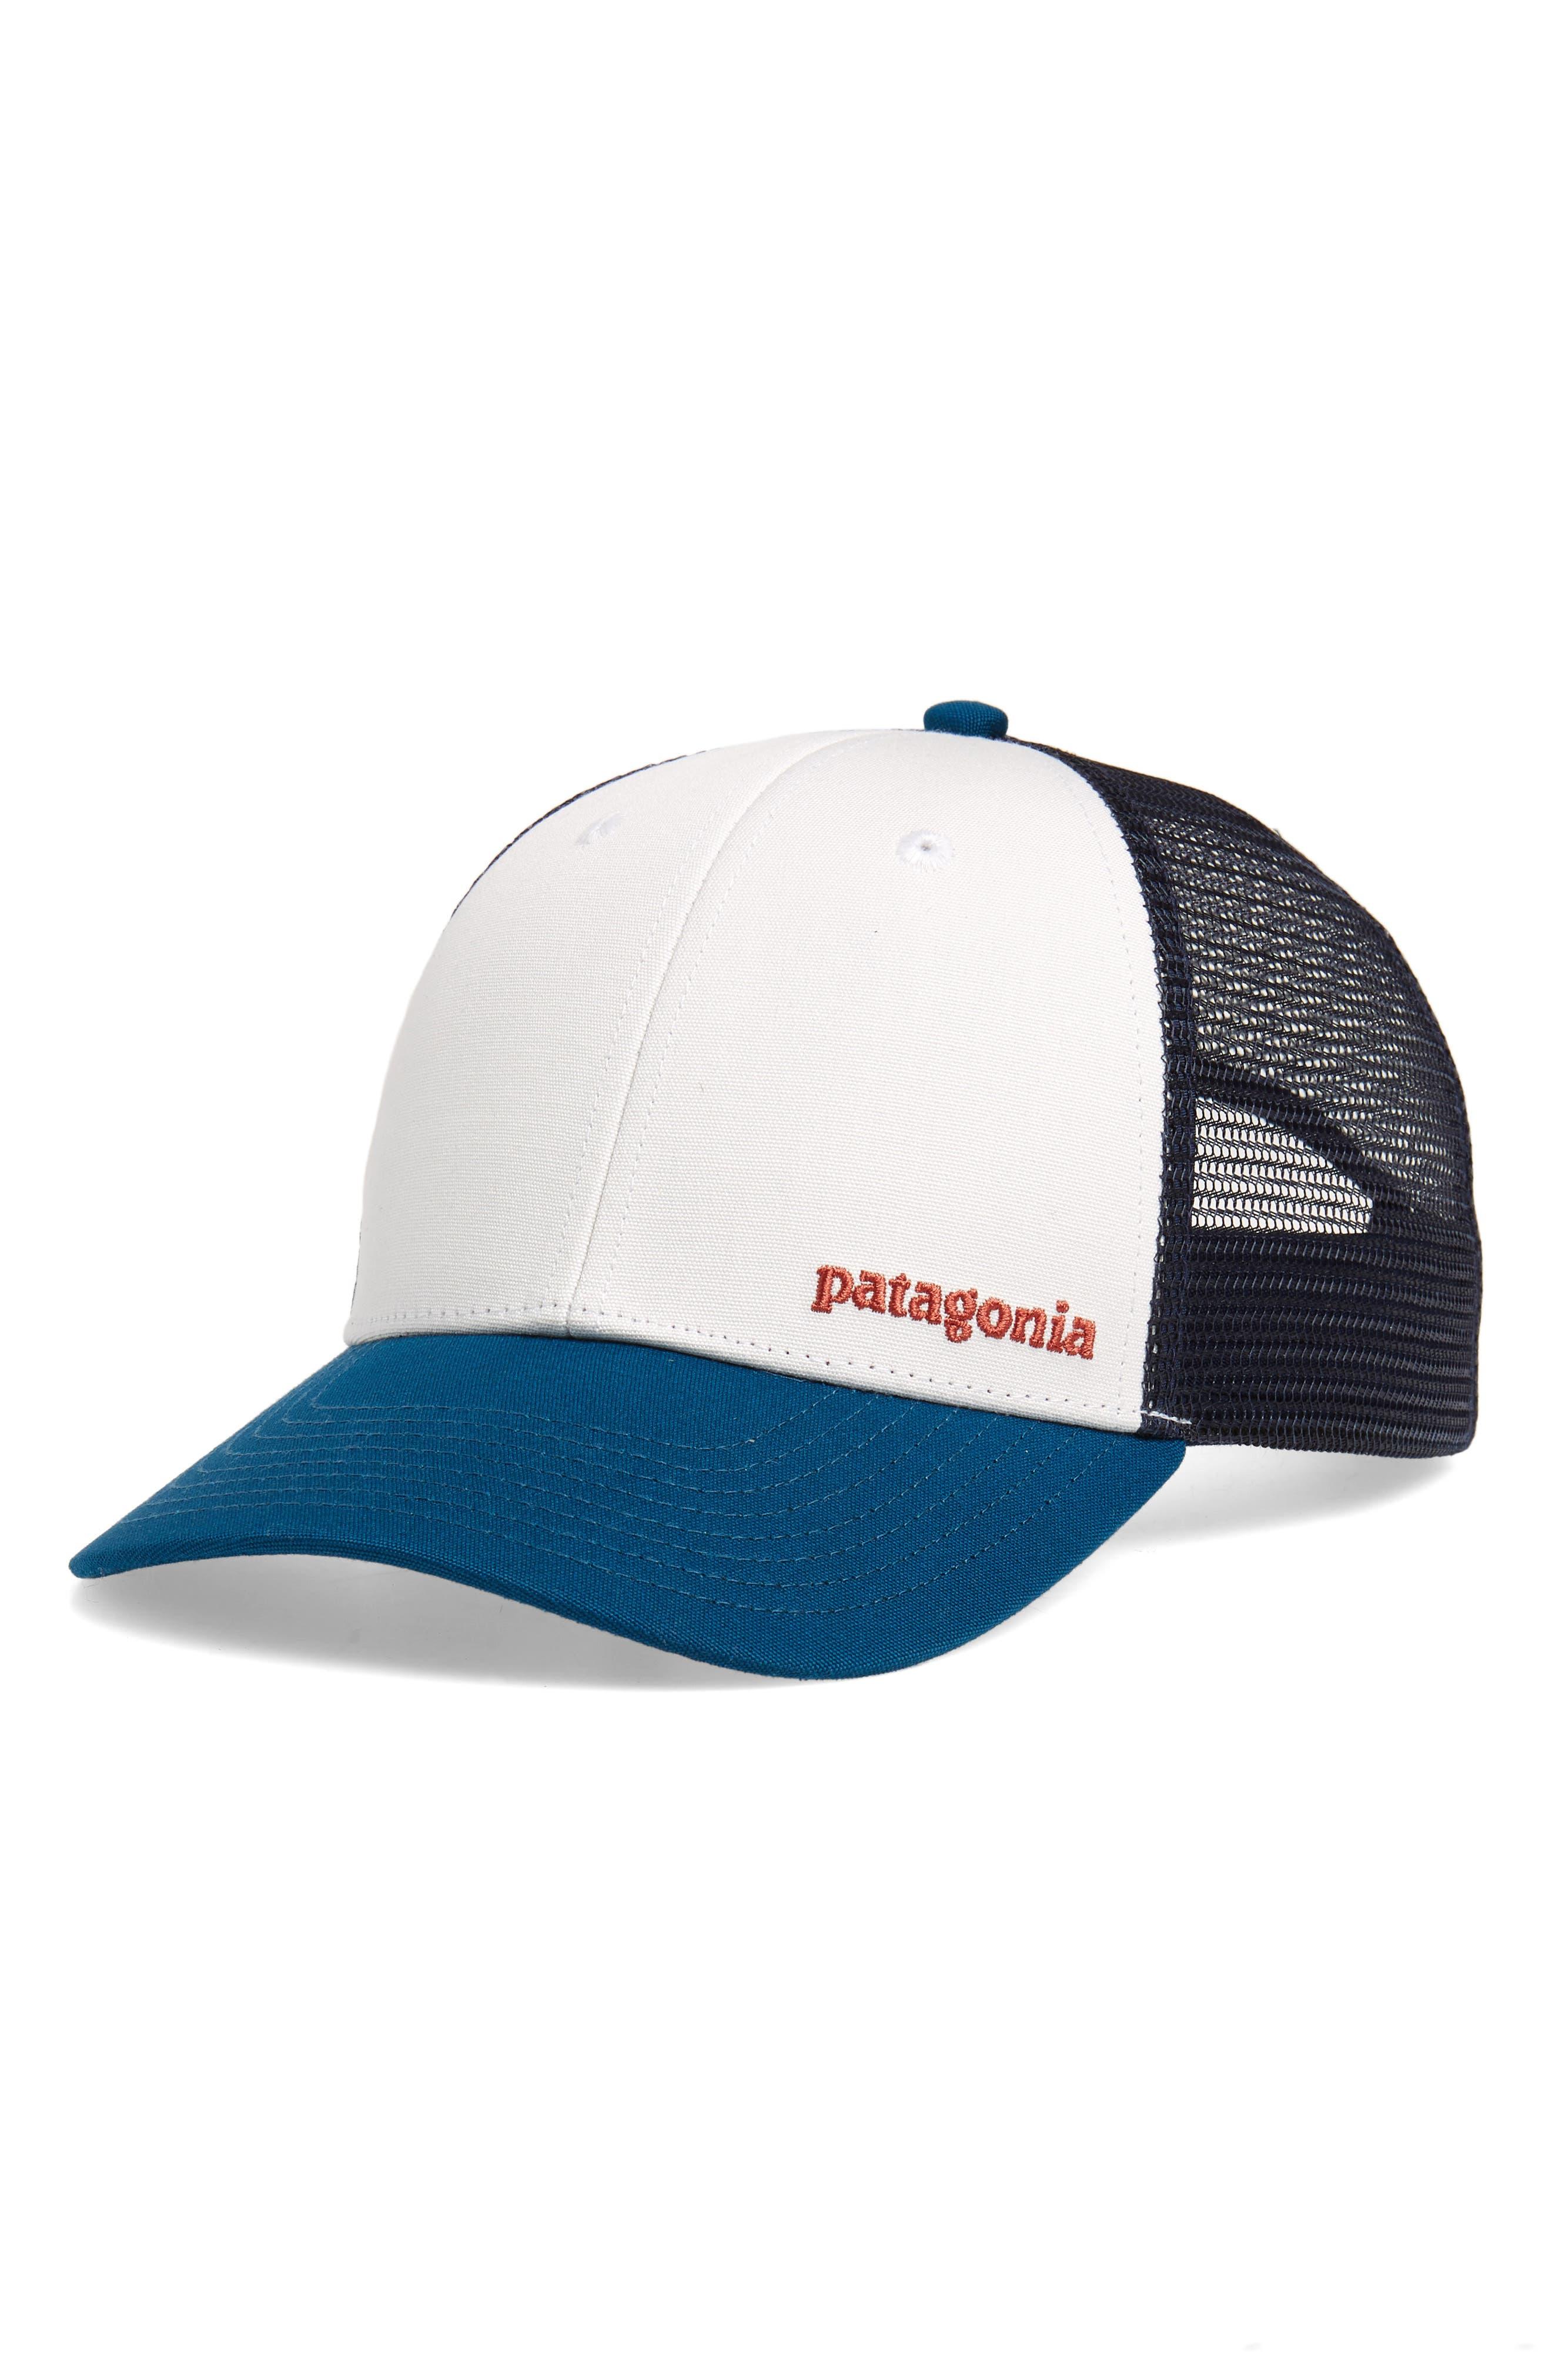 patagonia hat  0c13128f320